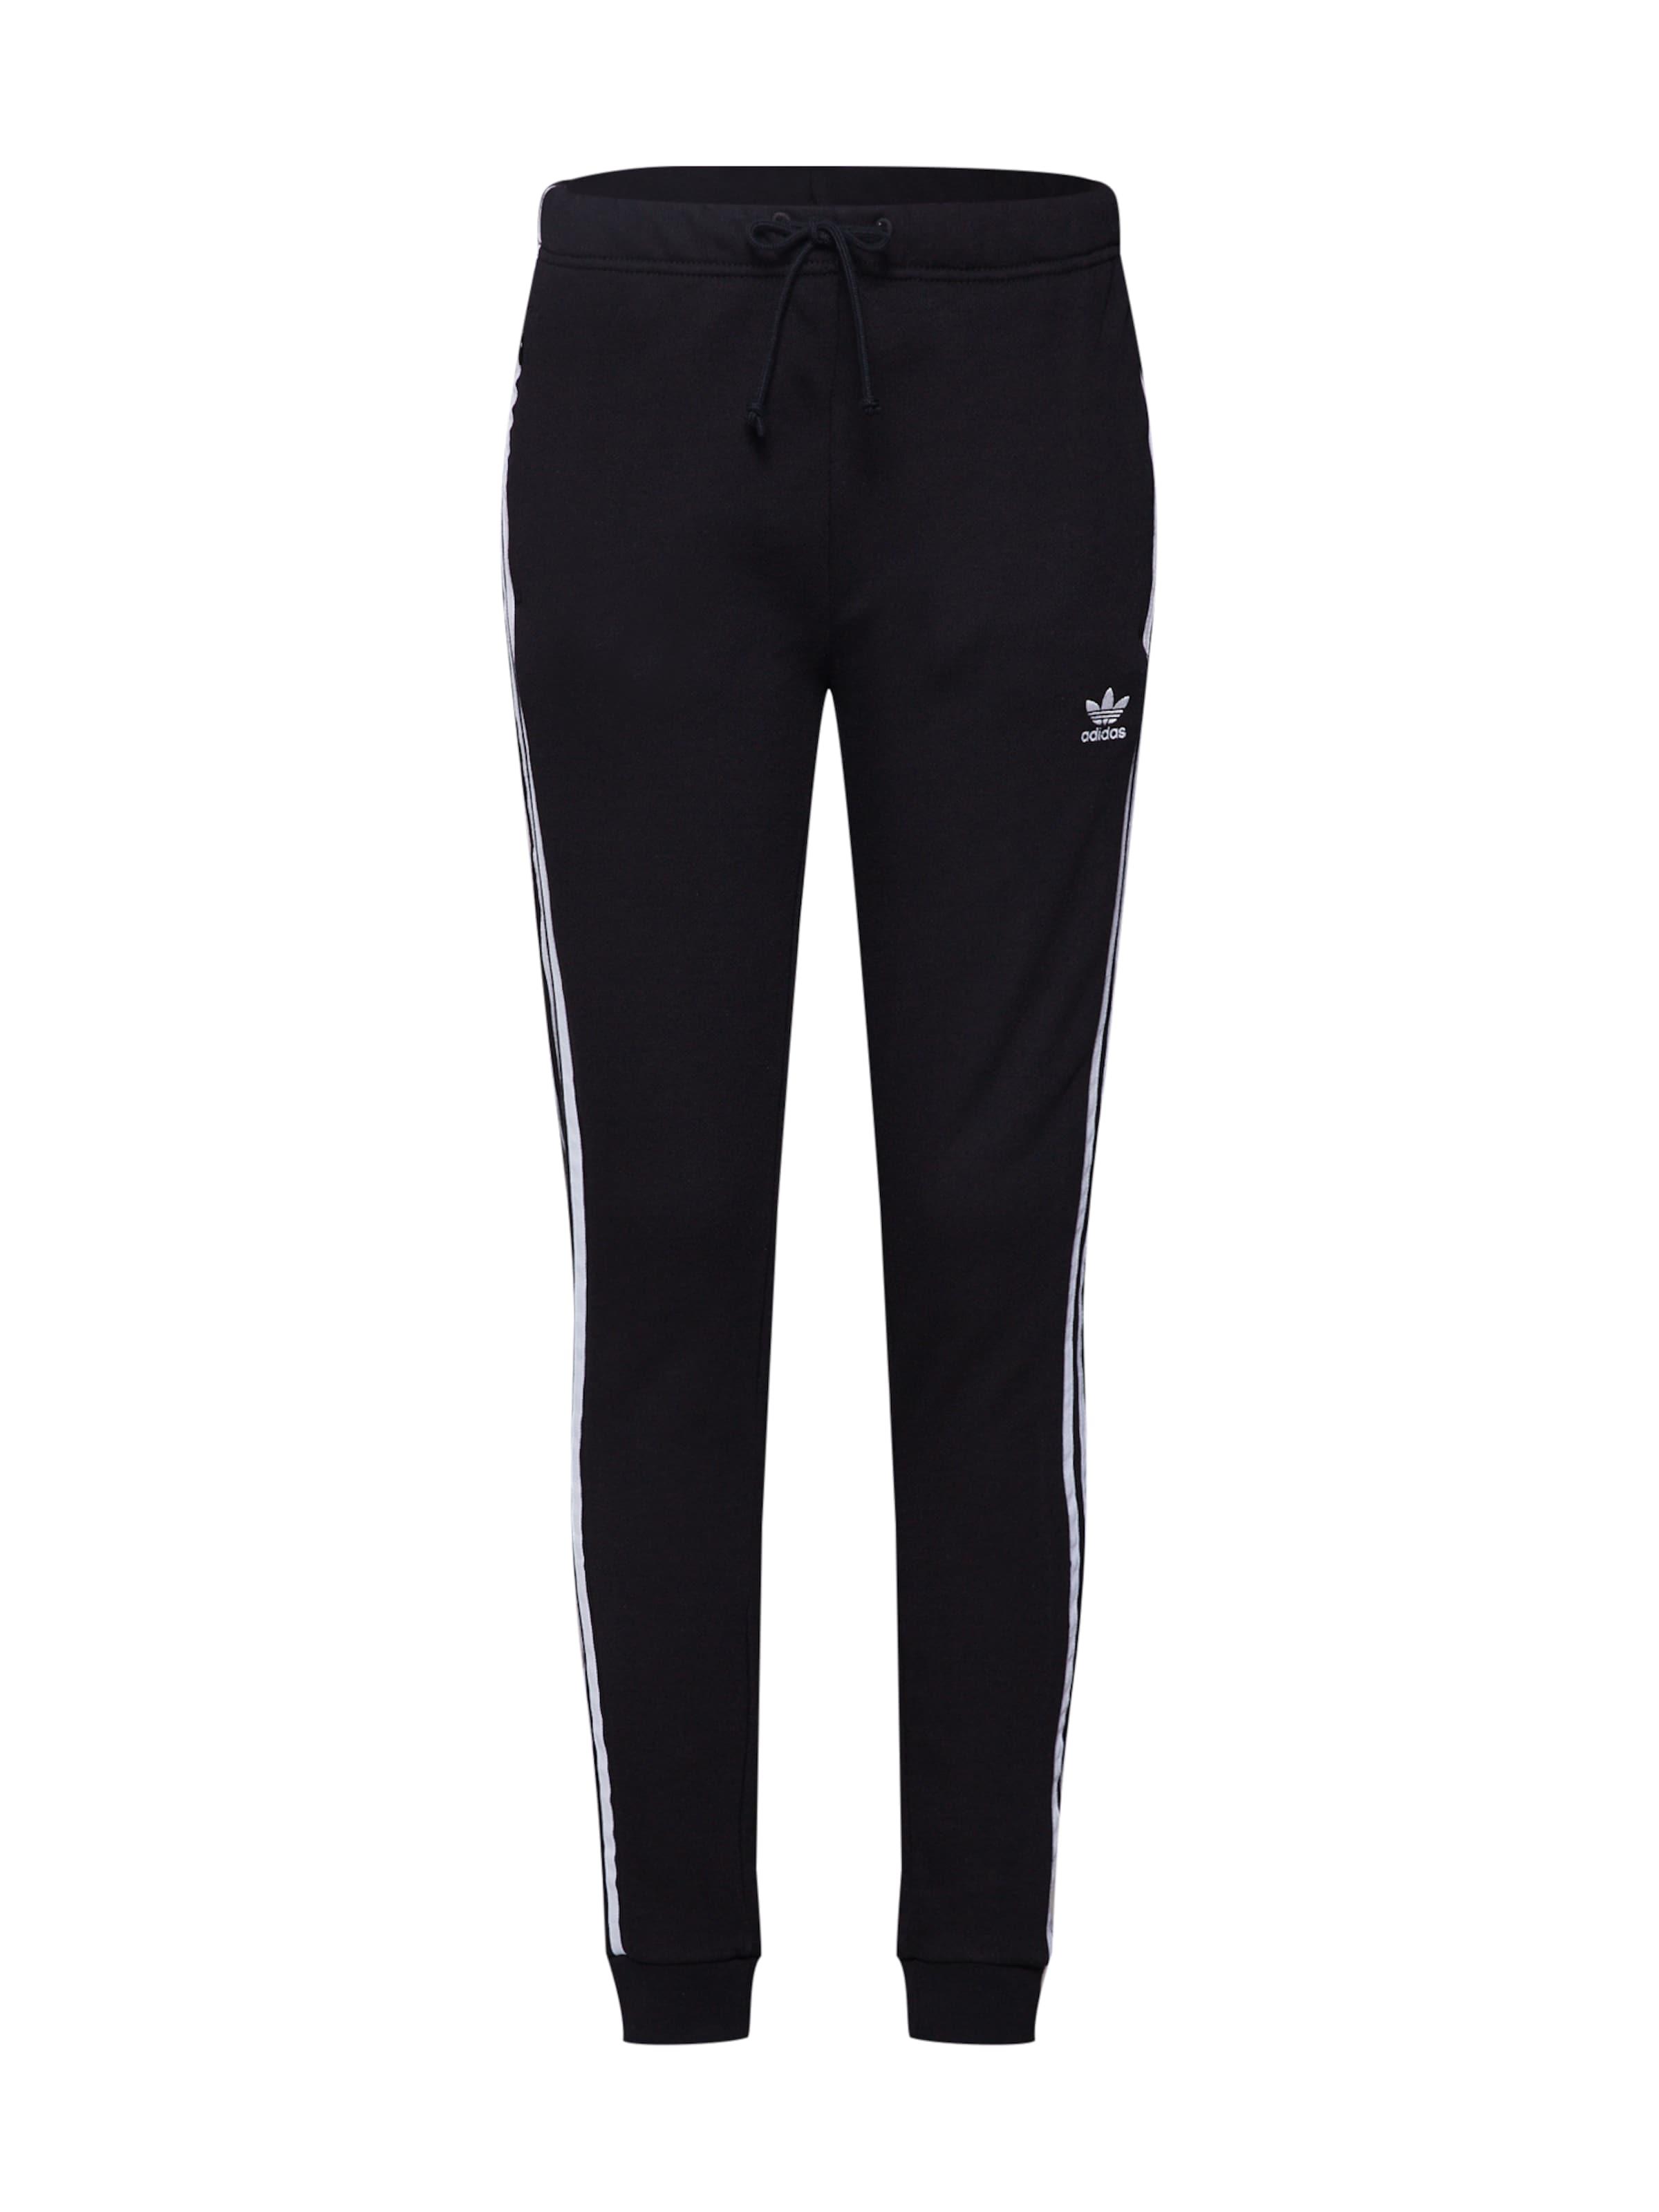 Adidas En 'tp Pantalon NoirBlanc Cuf' Originals wPkZiuTXOl